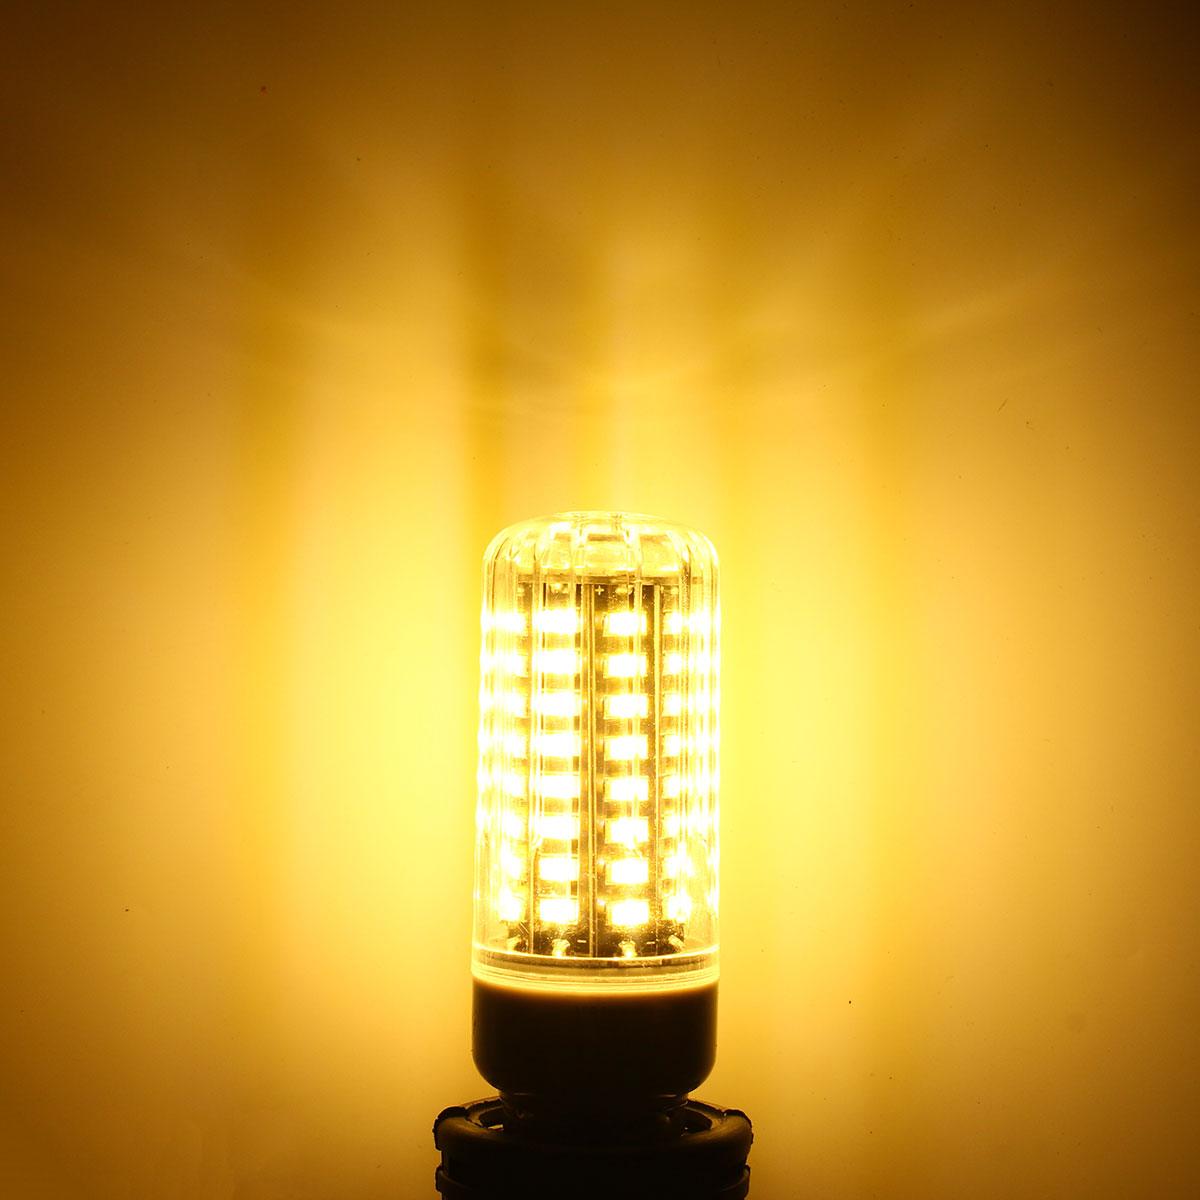 e27 e14 e12 e17 gu10 b22 led corn bulb 7w 72 smd 5736 led. Black Bedroom Furniture Sets. Home Design Ideas